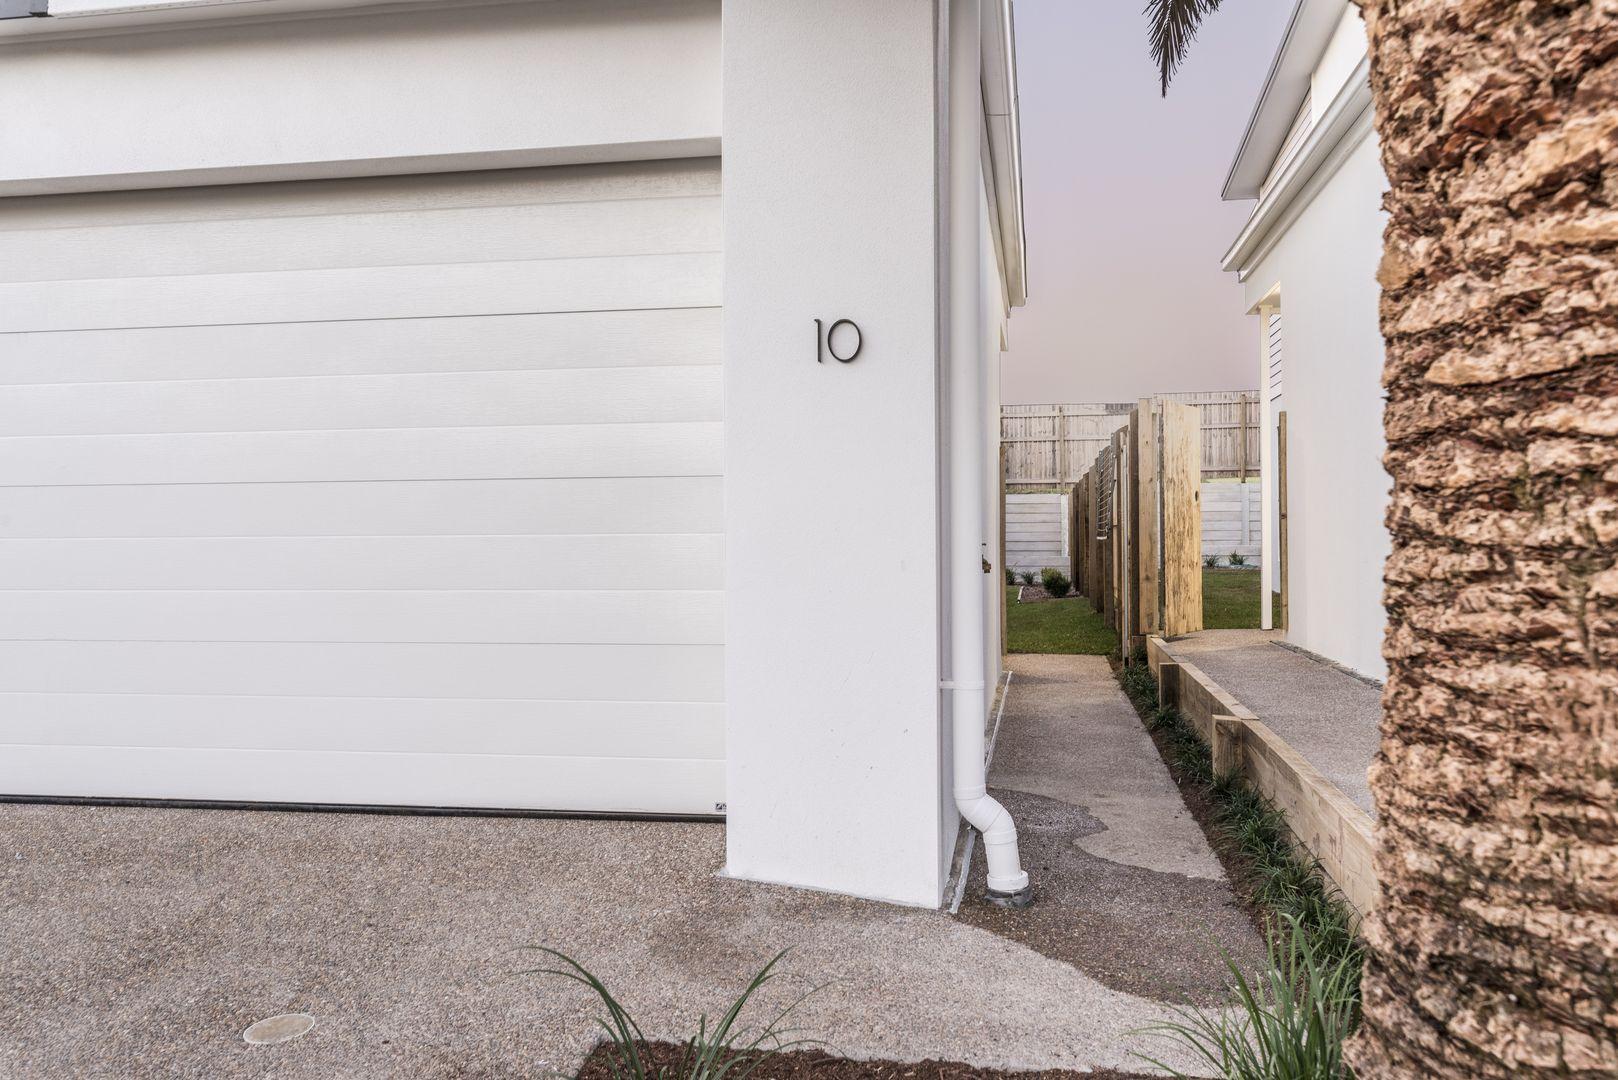 10/7 Giosam Street, Richlands QLD 4077, Image 0